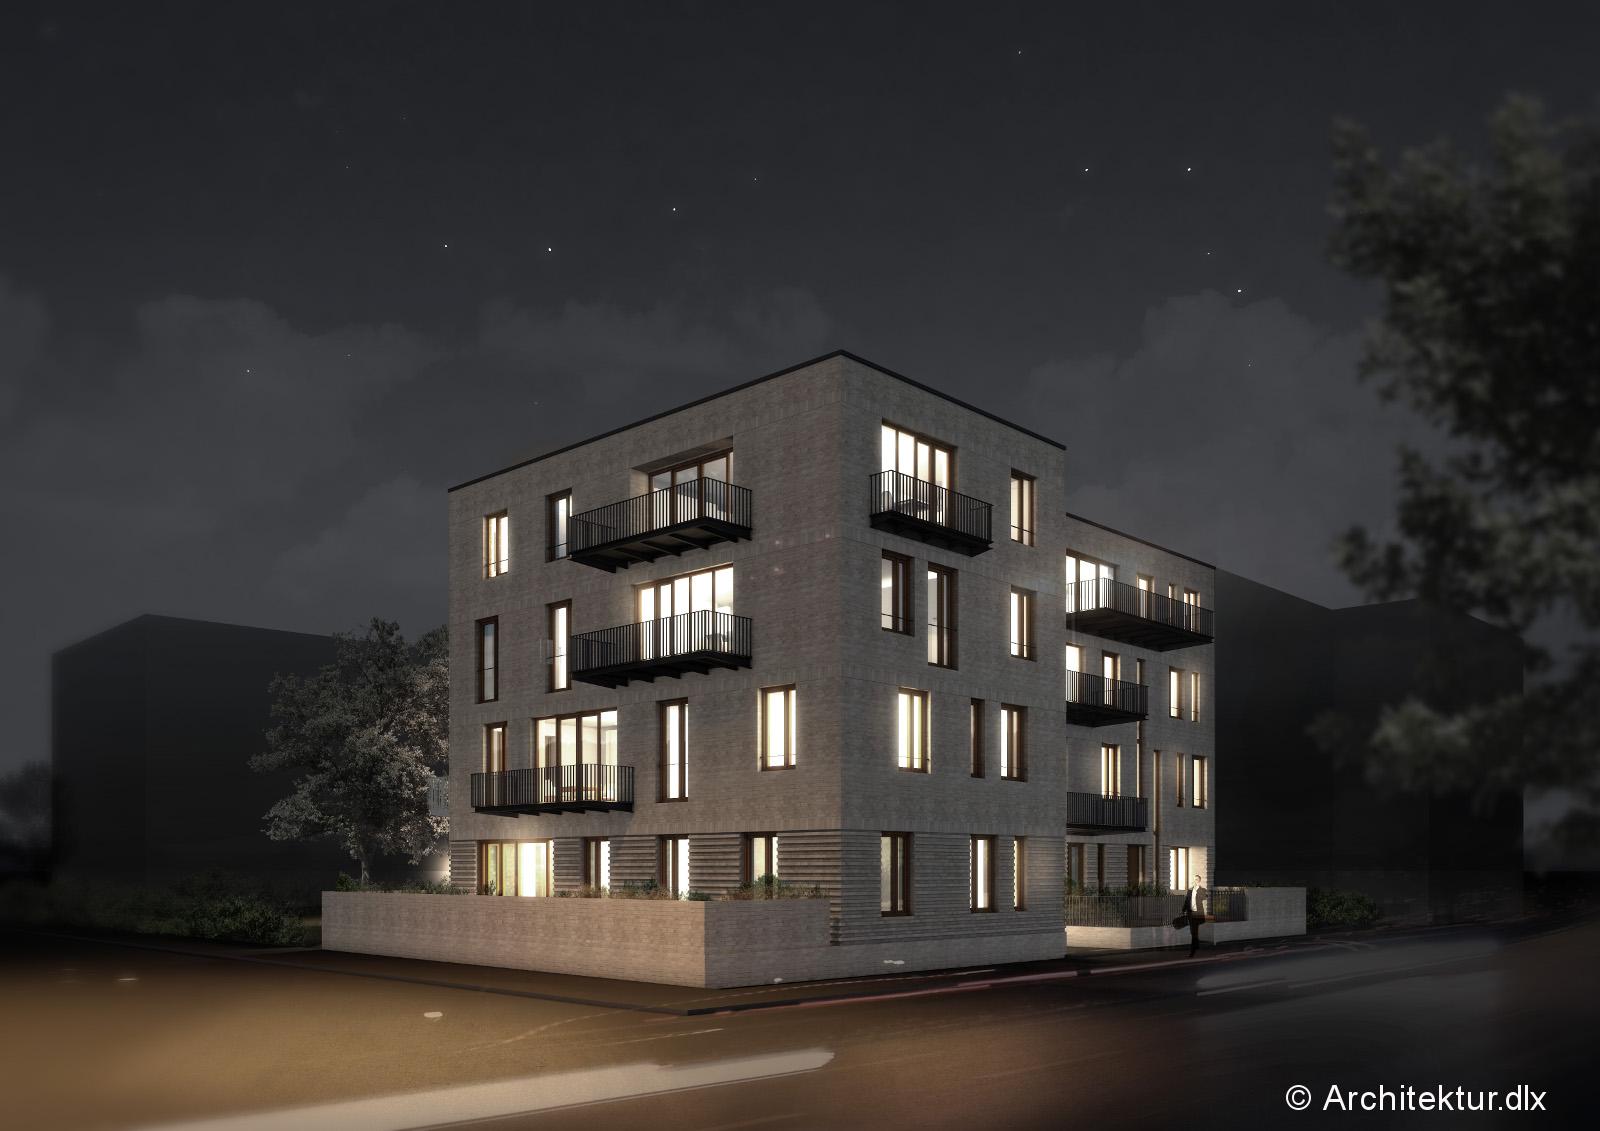 Köln - Clouth9 - Architektur